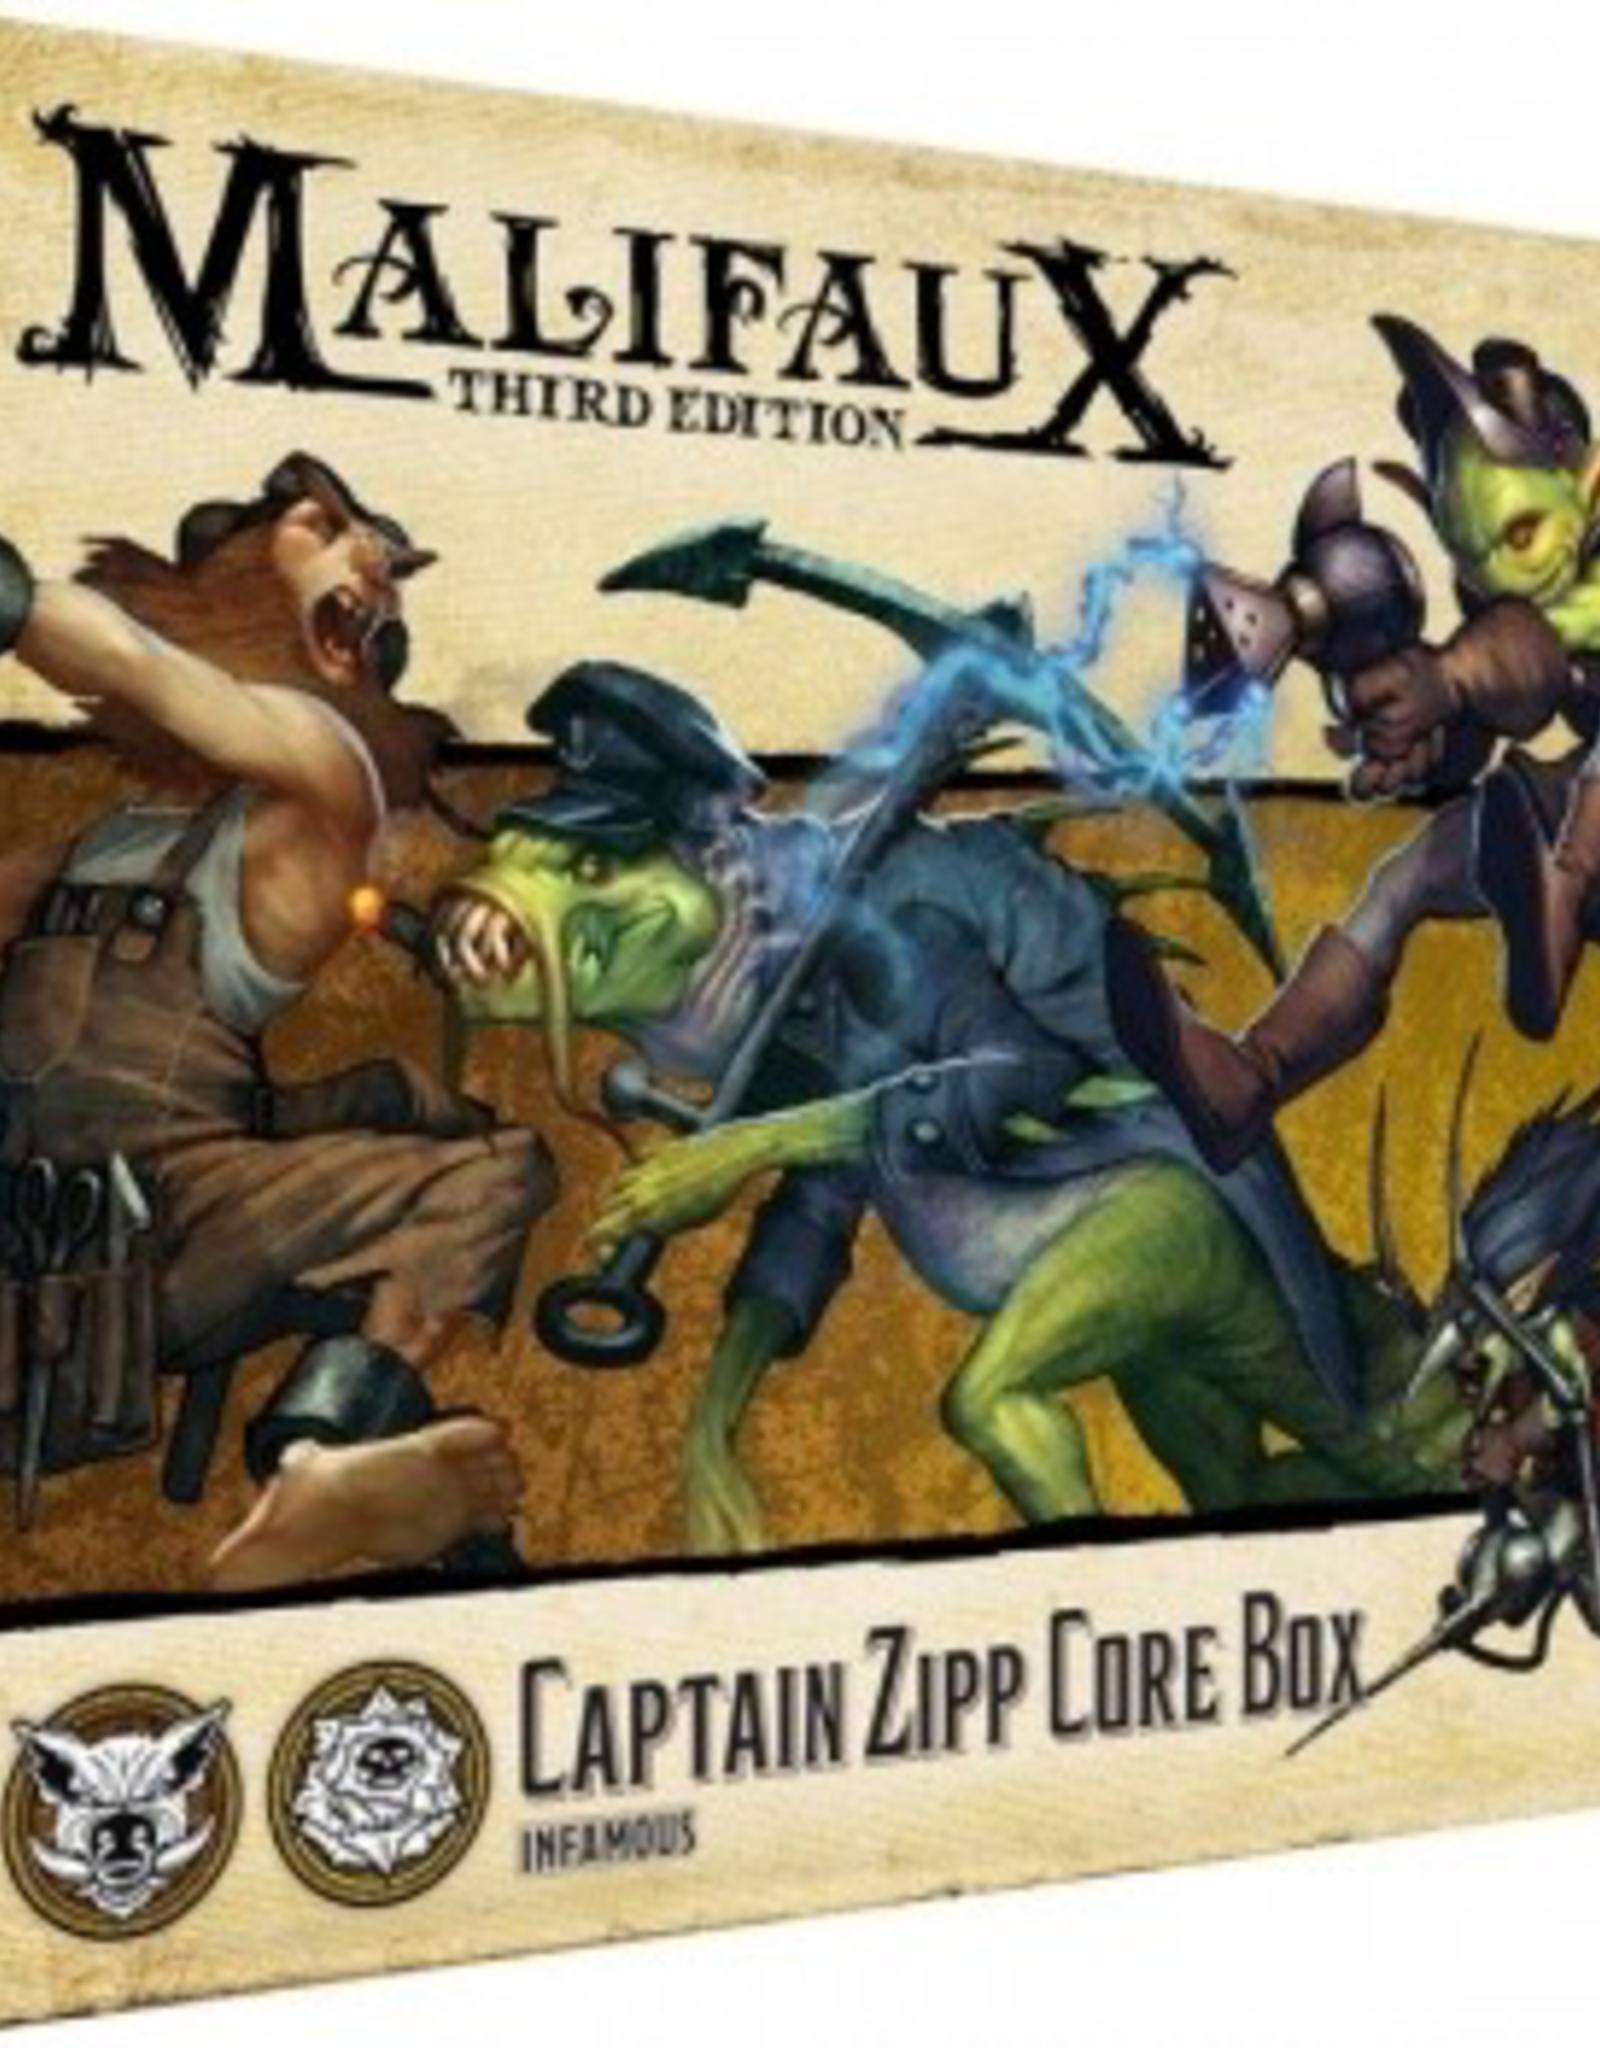 WYR - Malifaux Miniaturen Malifaux 3rd Edition - Zipp Core Box - EN